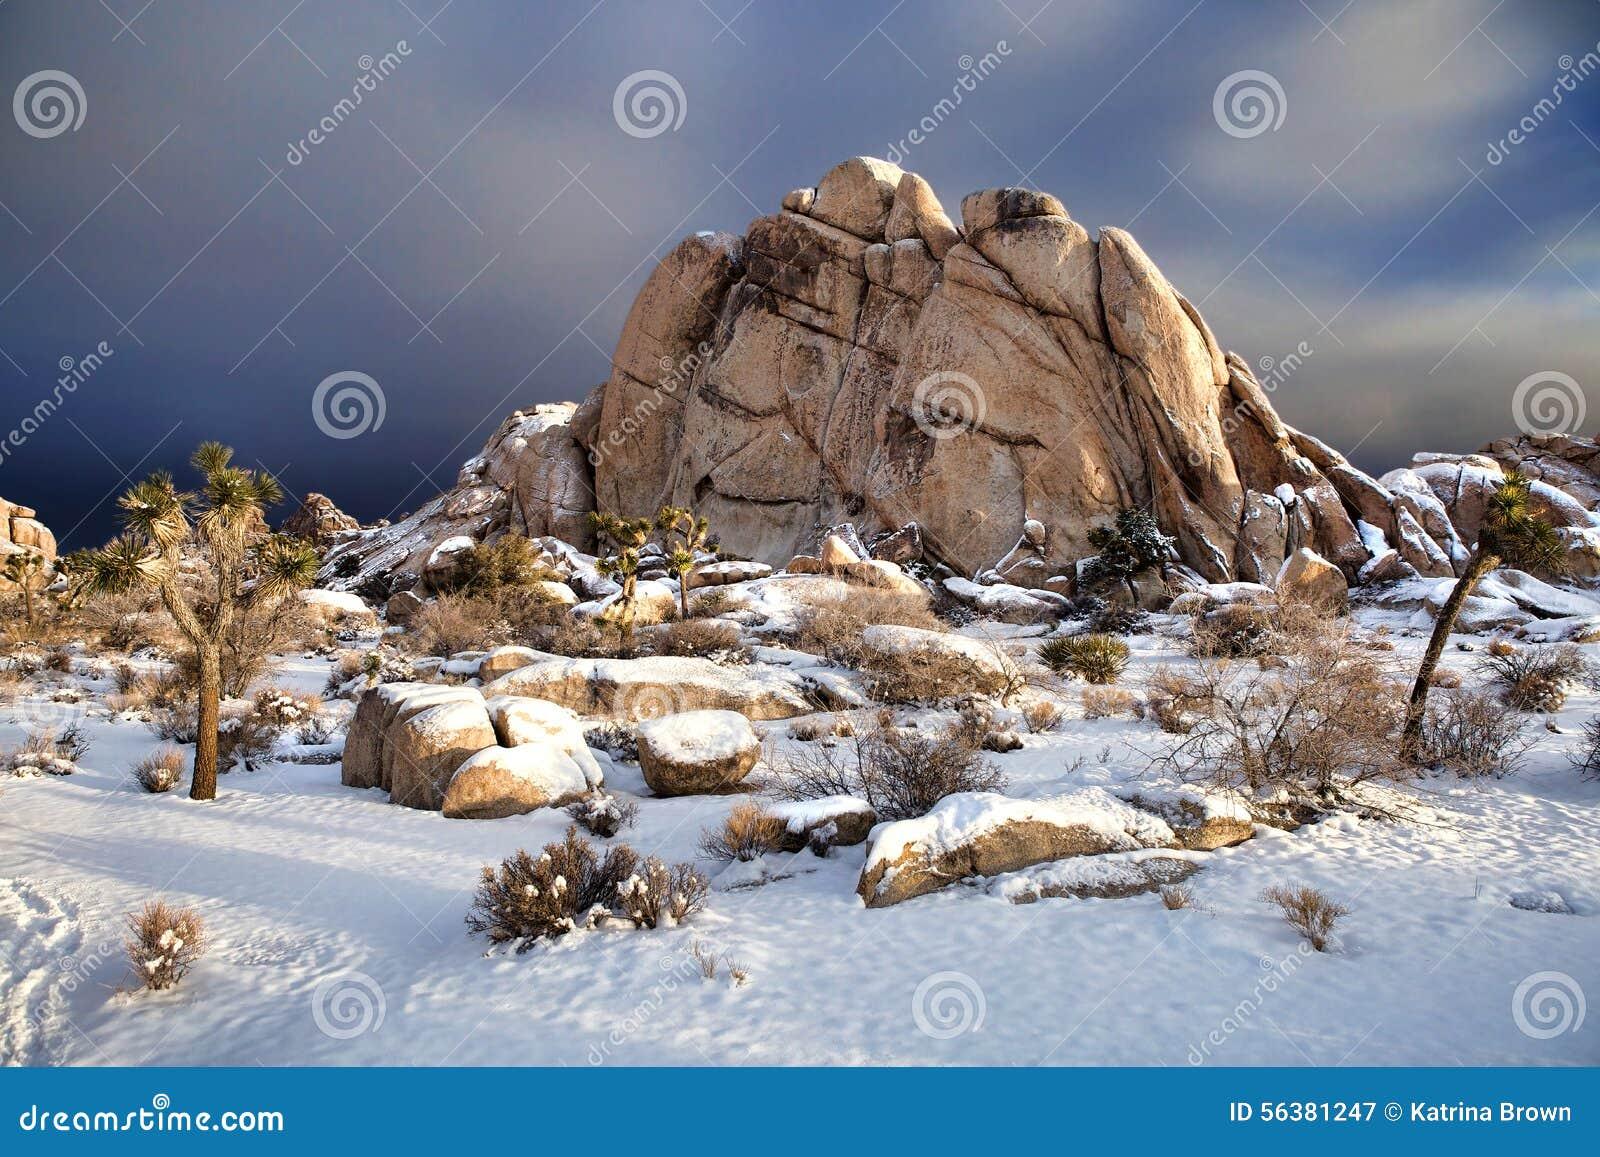 Snowy Landscape In Joshua Tree National Park Stock Image